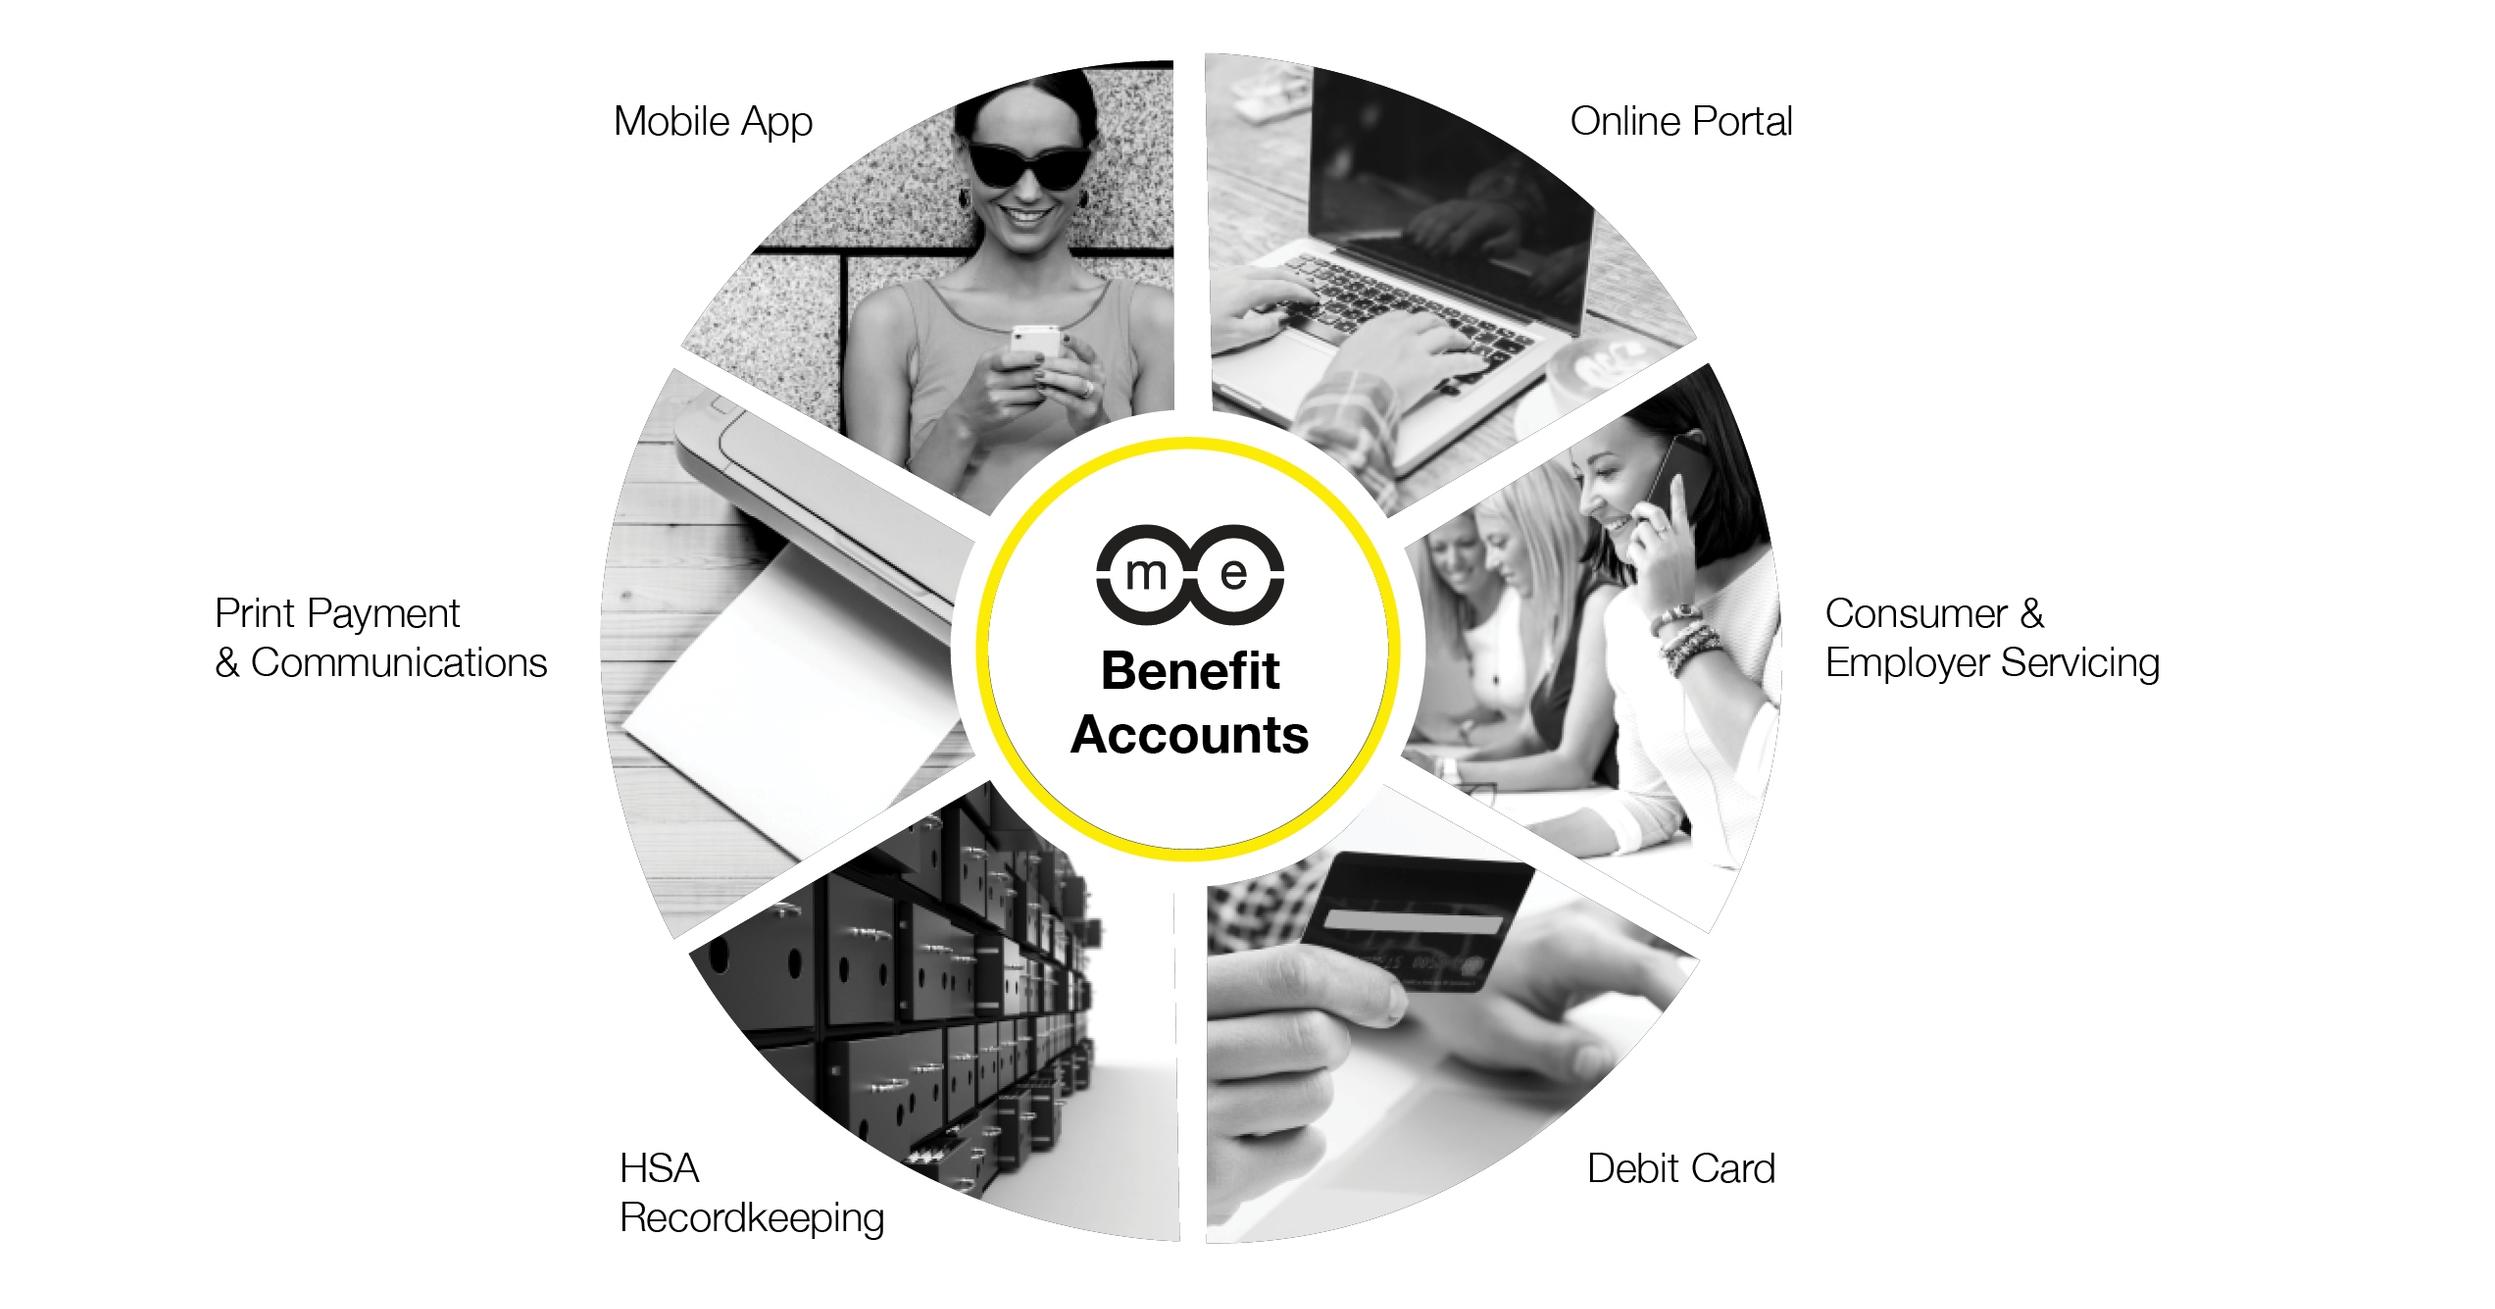 BenefitAccounts_Circle_020316_r2.jpg